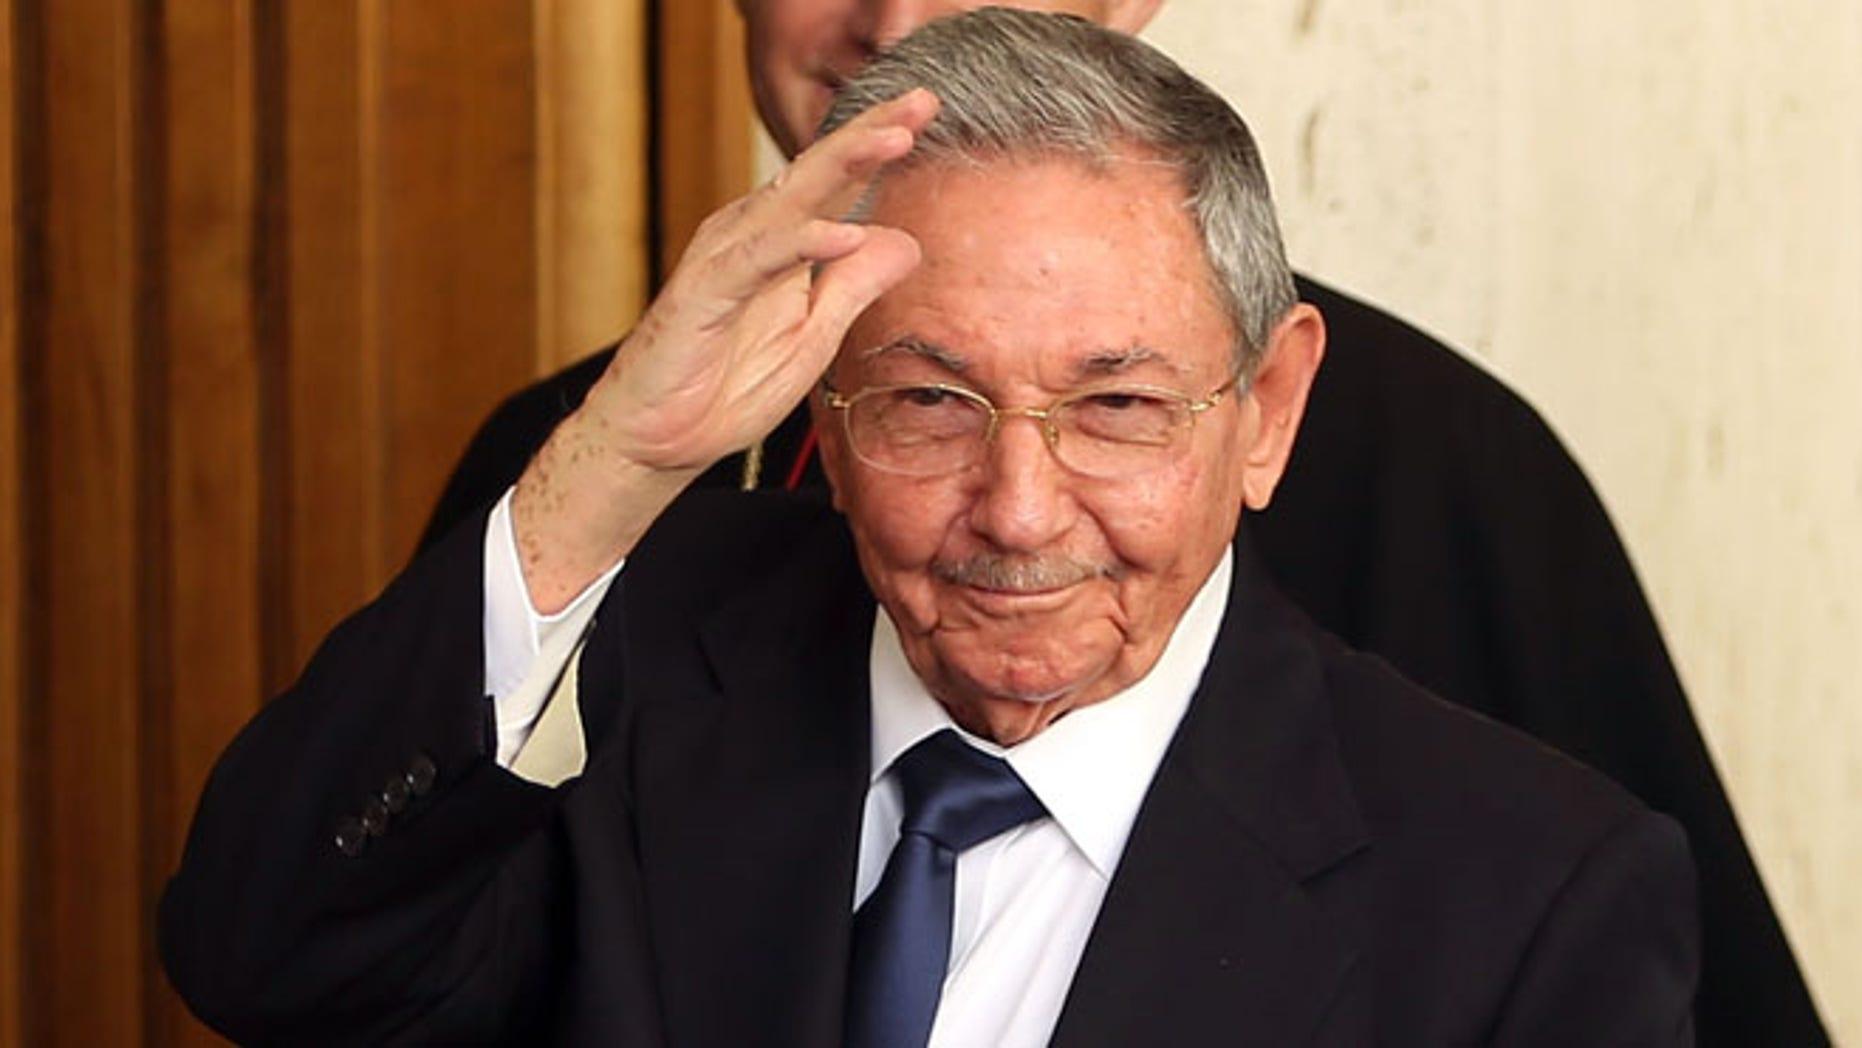 President of Cuba Raúl Castro on May 10, 2015 in Vatican City, Vatican.